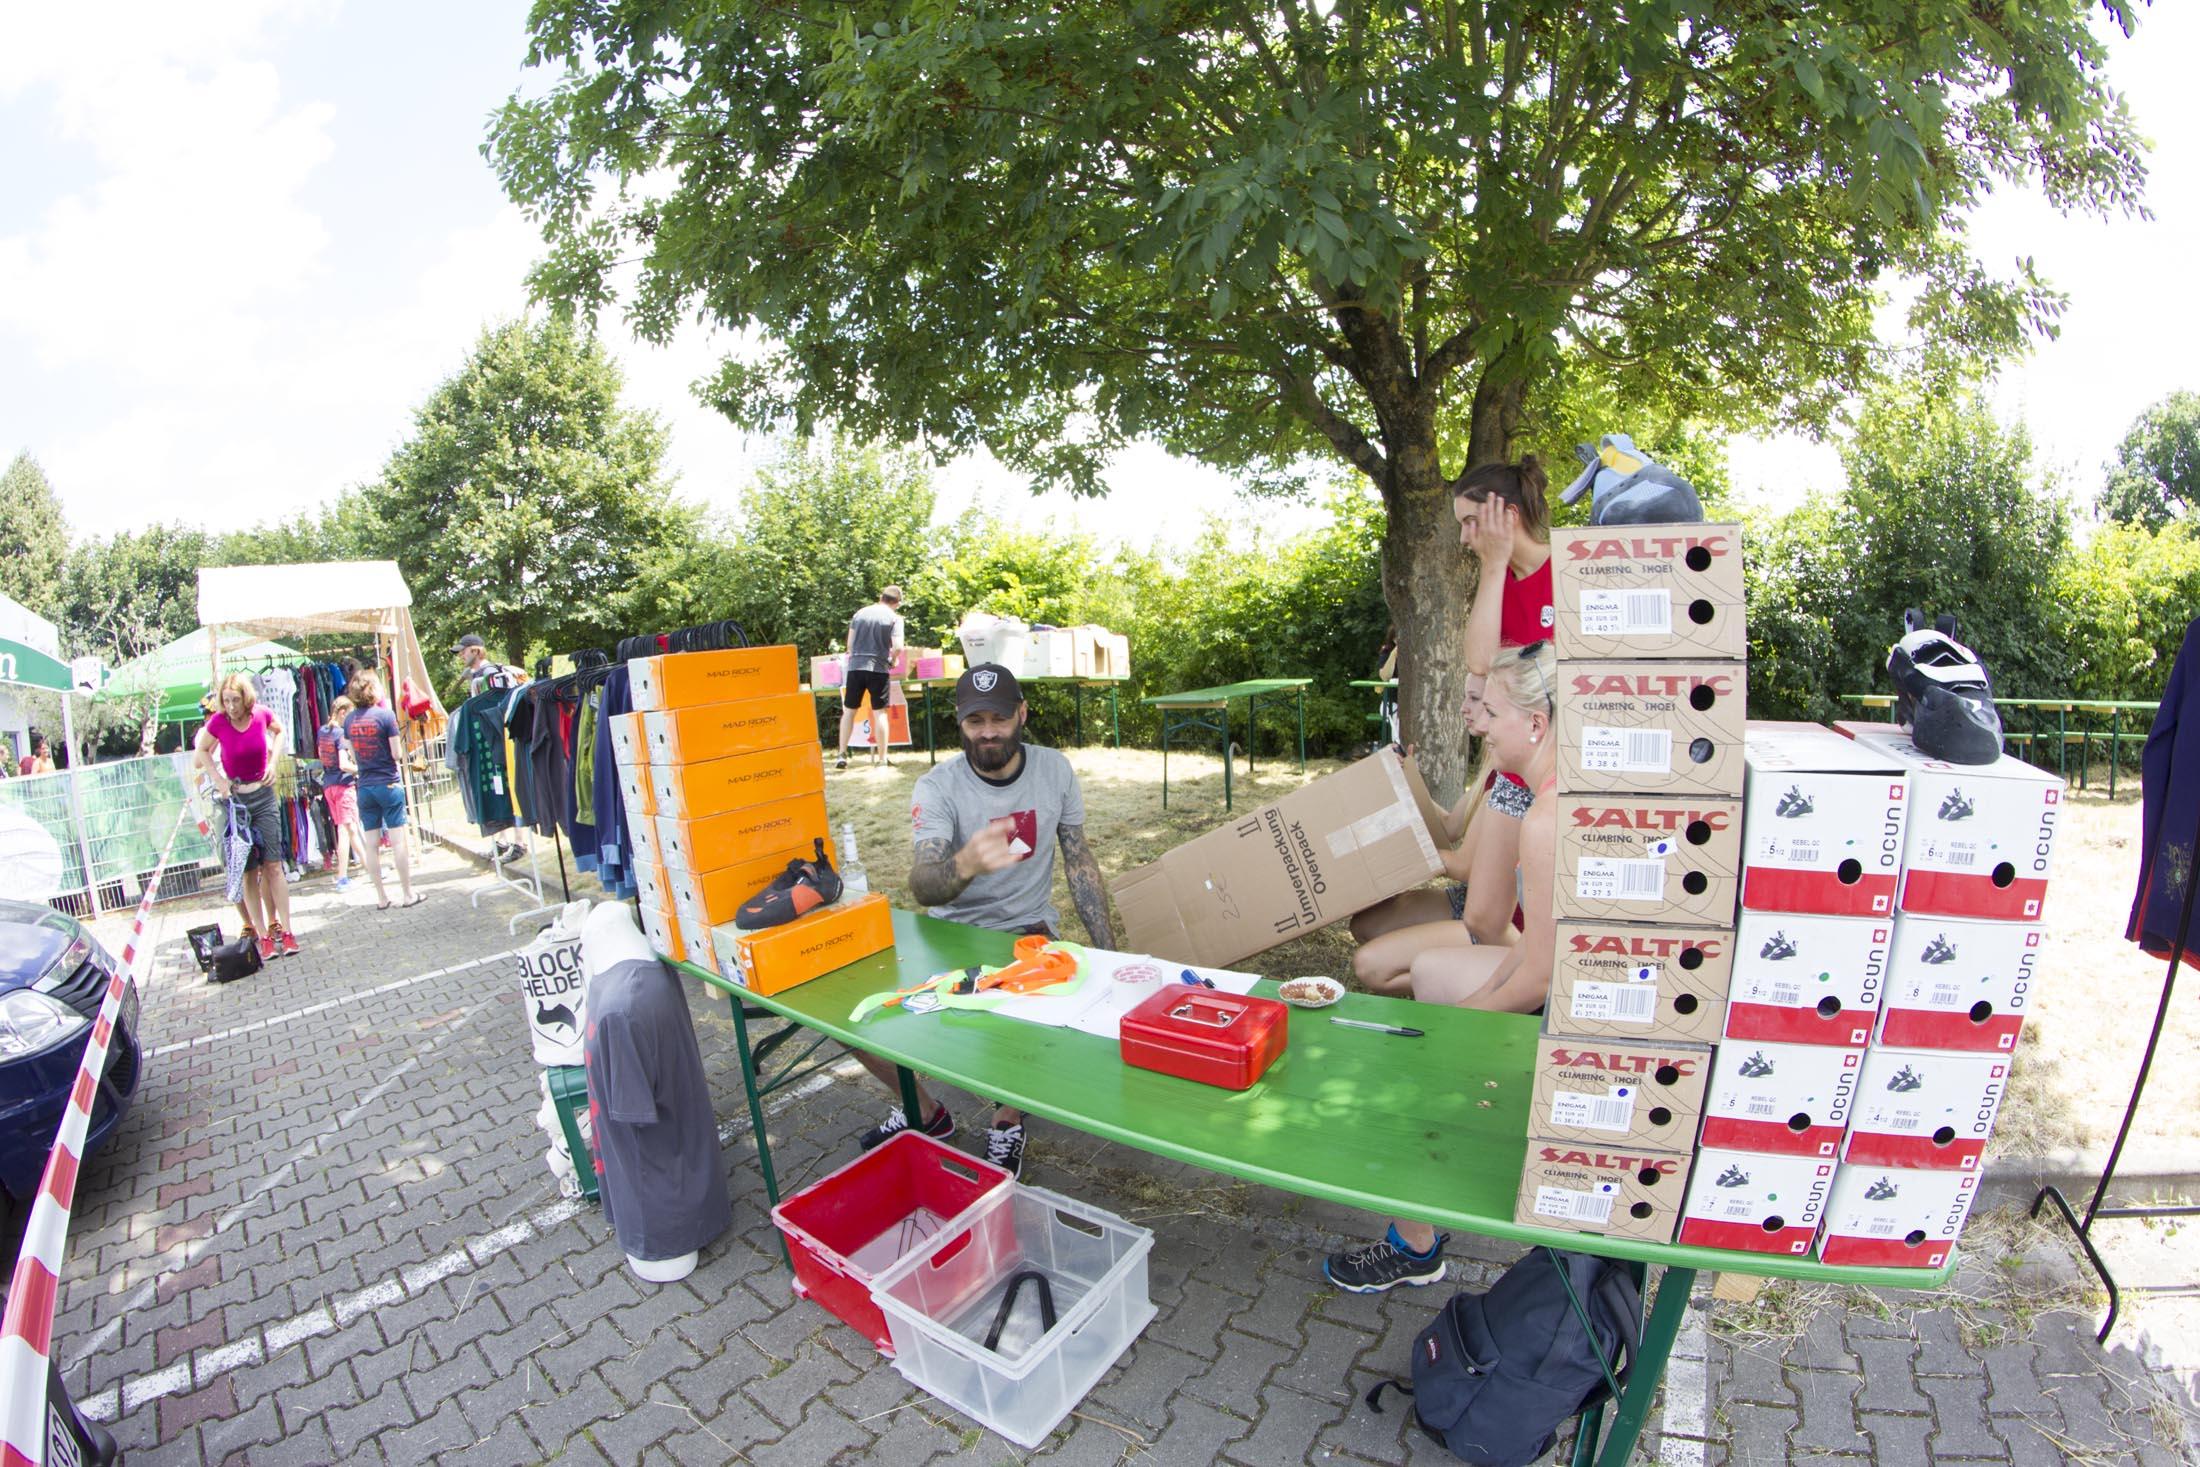 Registration internationaler bouldercup Frankenjura 2016, BLOCKHELDEN Erlangen, Mammut, Bergfreunde.de, Boulderwettkampf07092016067